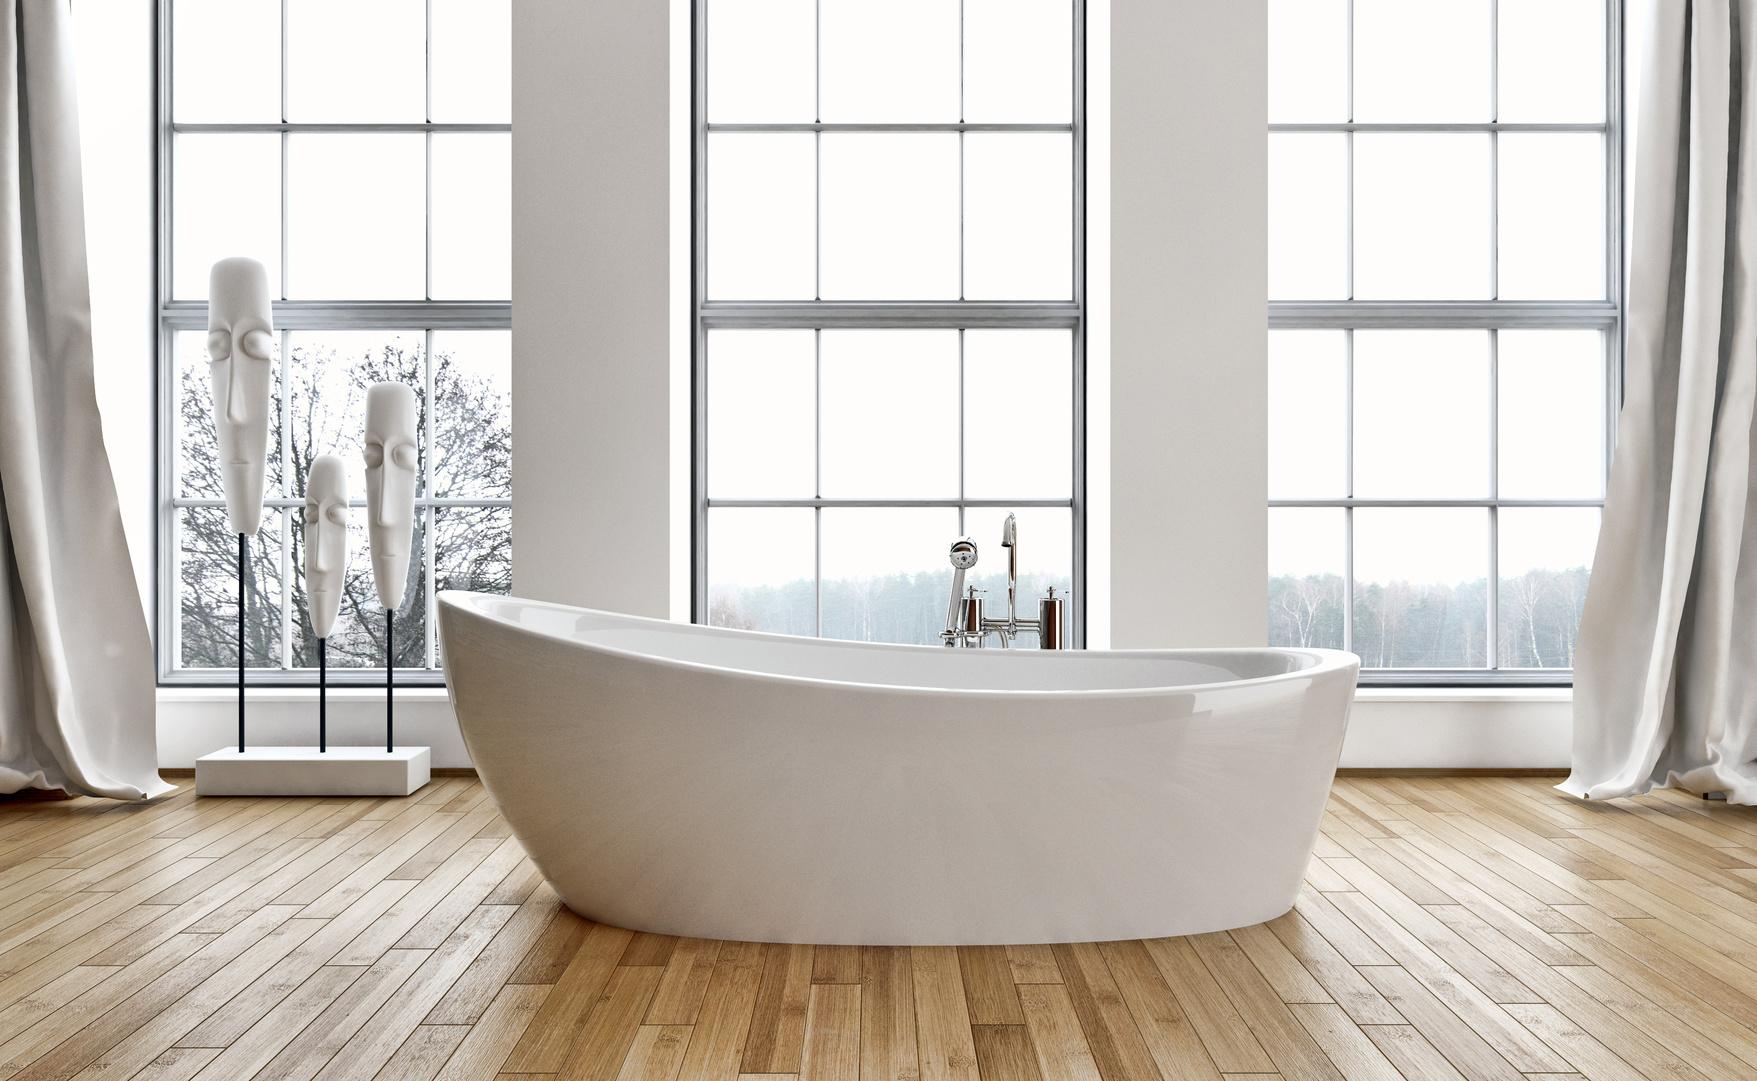 Architecture-salle-de-bain